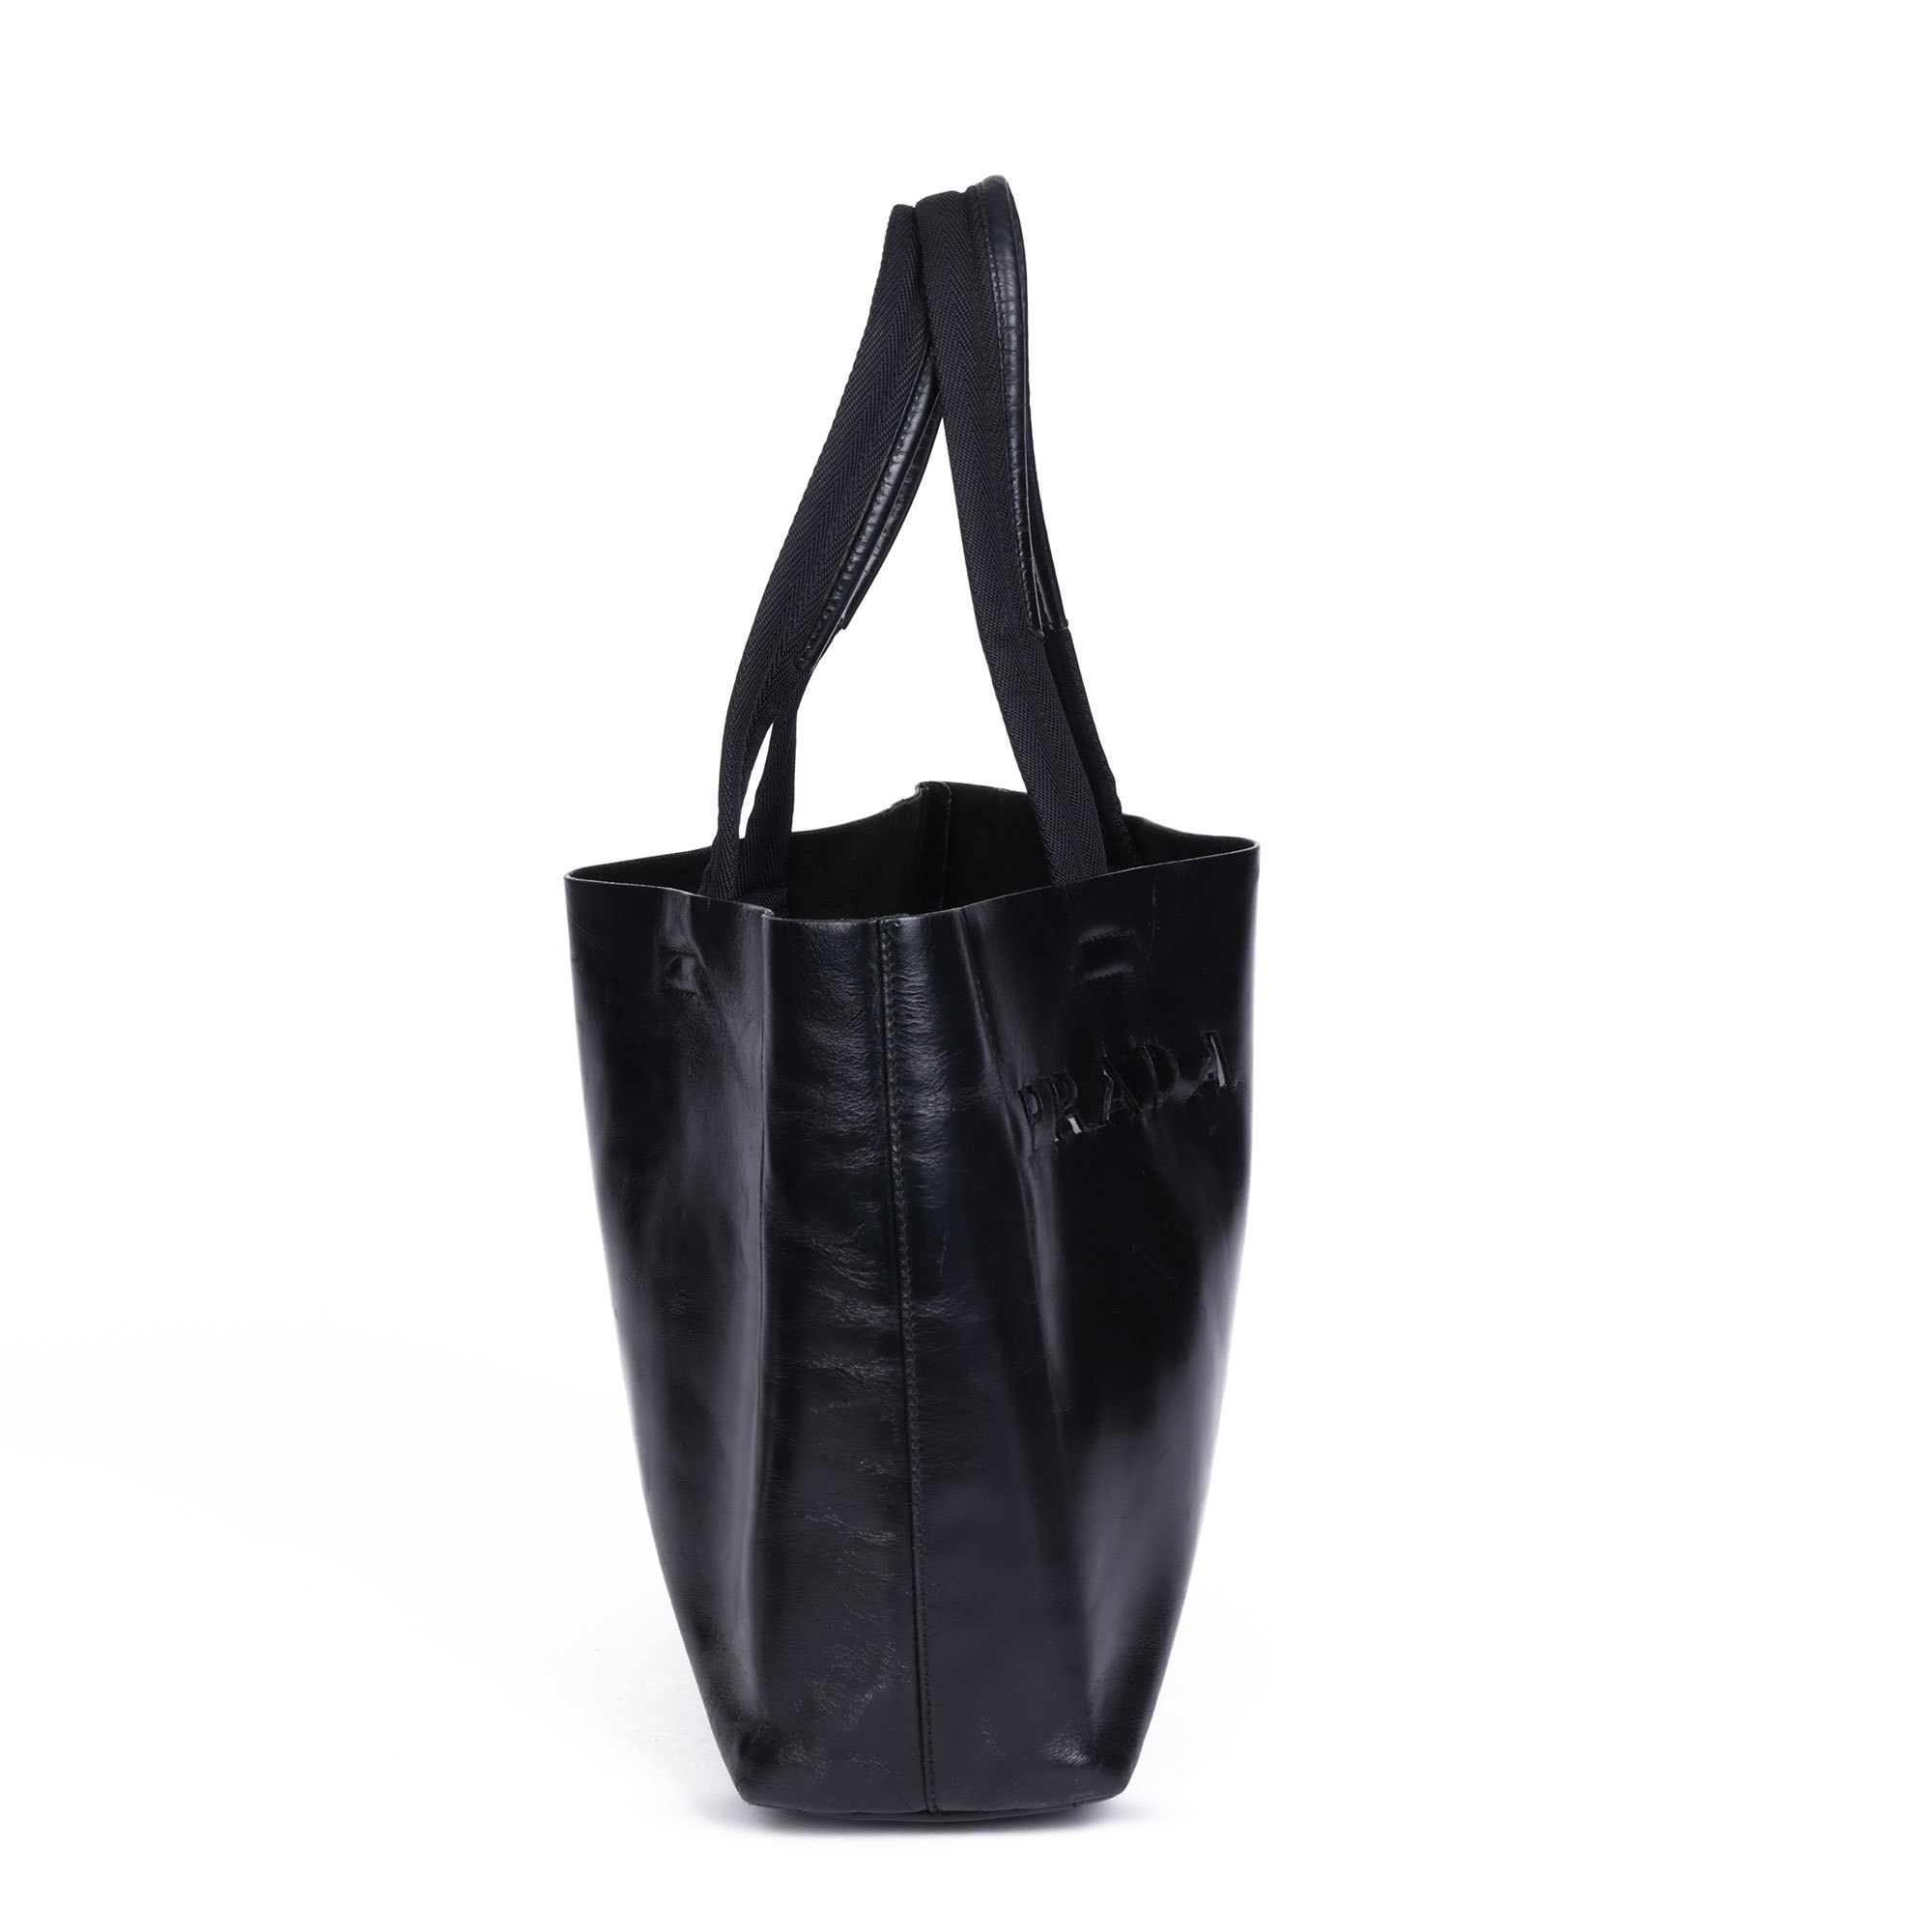 Prada Black Calfskin Leather Vintage Cut-Out Tote